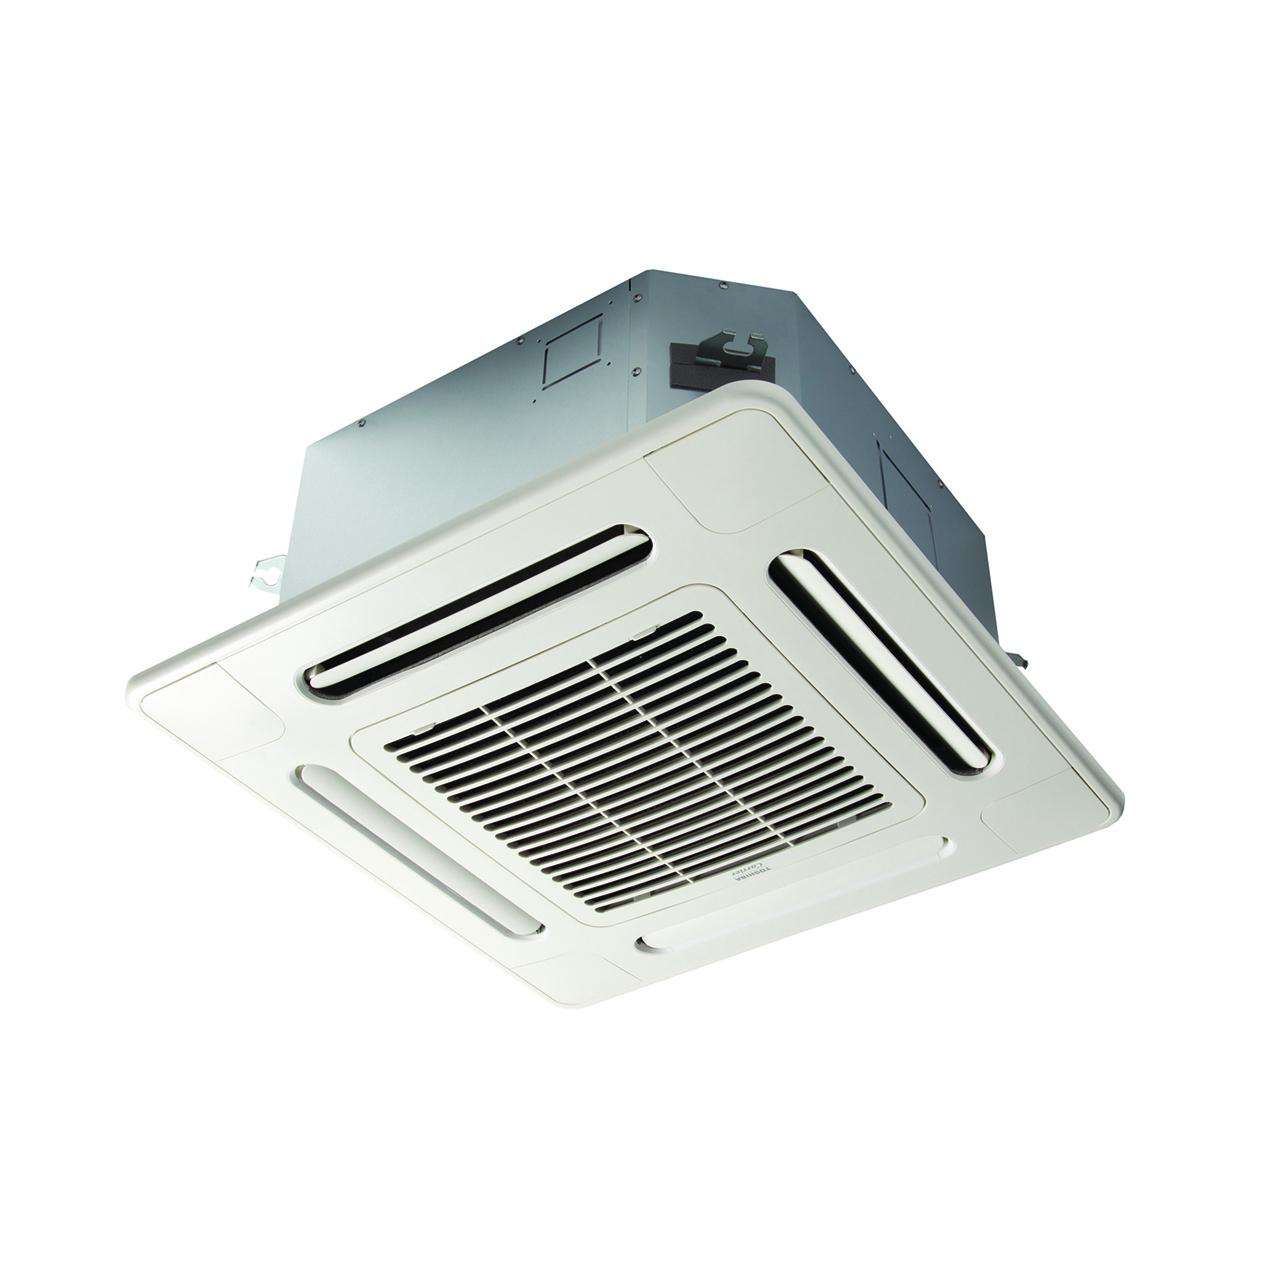 carrier-mmum-vrf-compact-4-way-cassette-indoor-unit